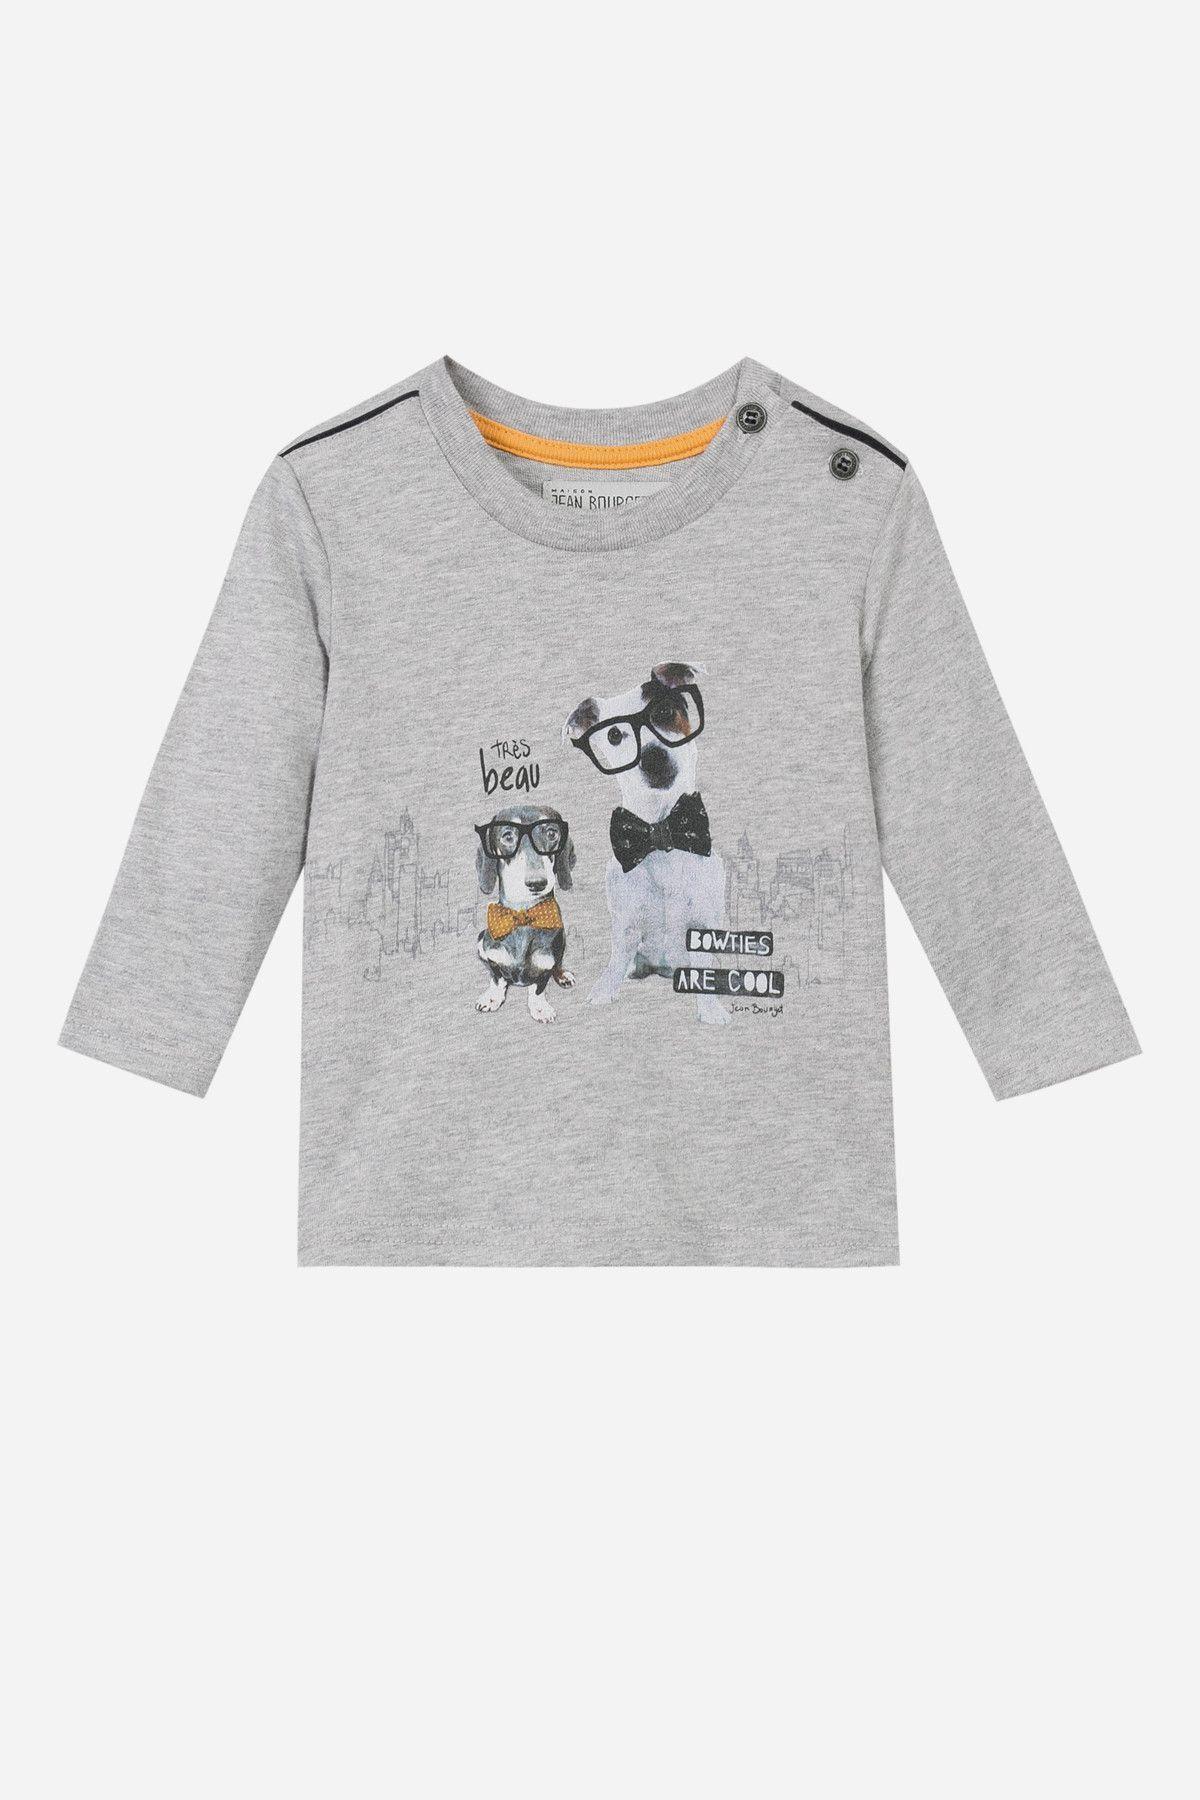 ecfdcb0c0 Jean Bourget Pedagogy T-Shirt from Mini Ruby